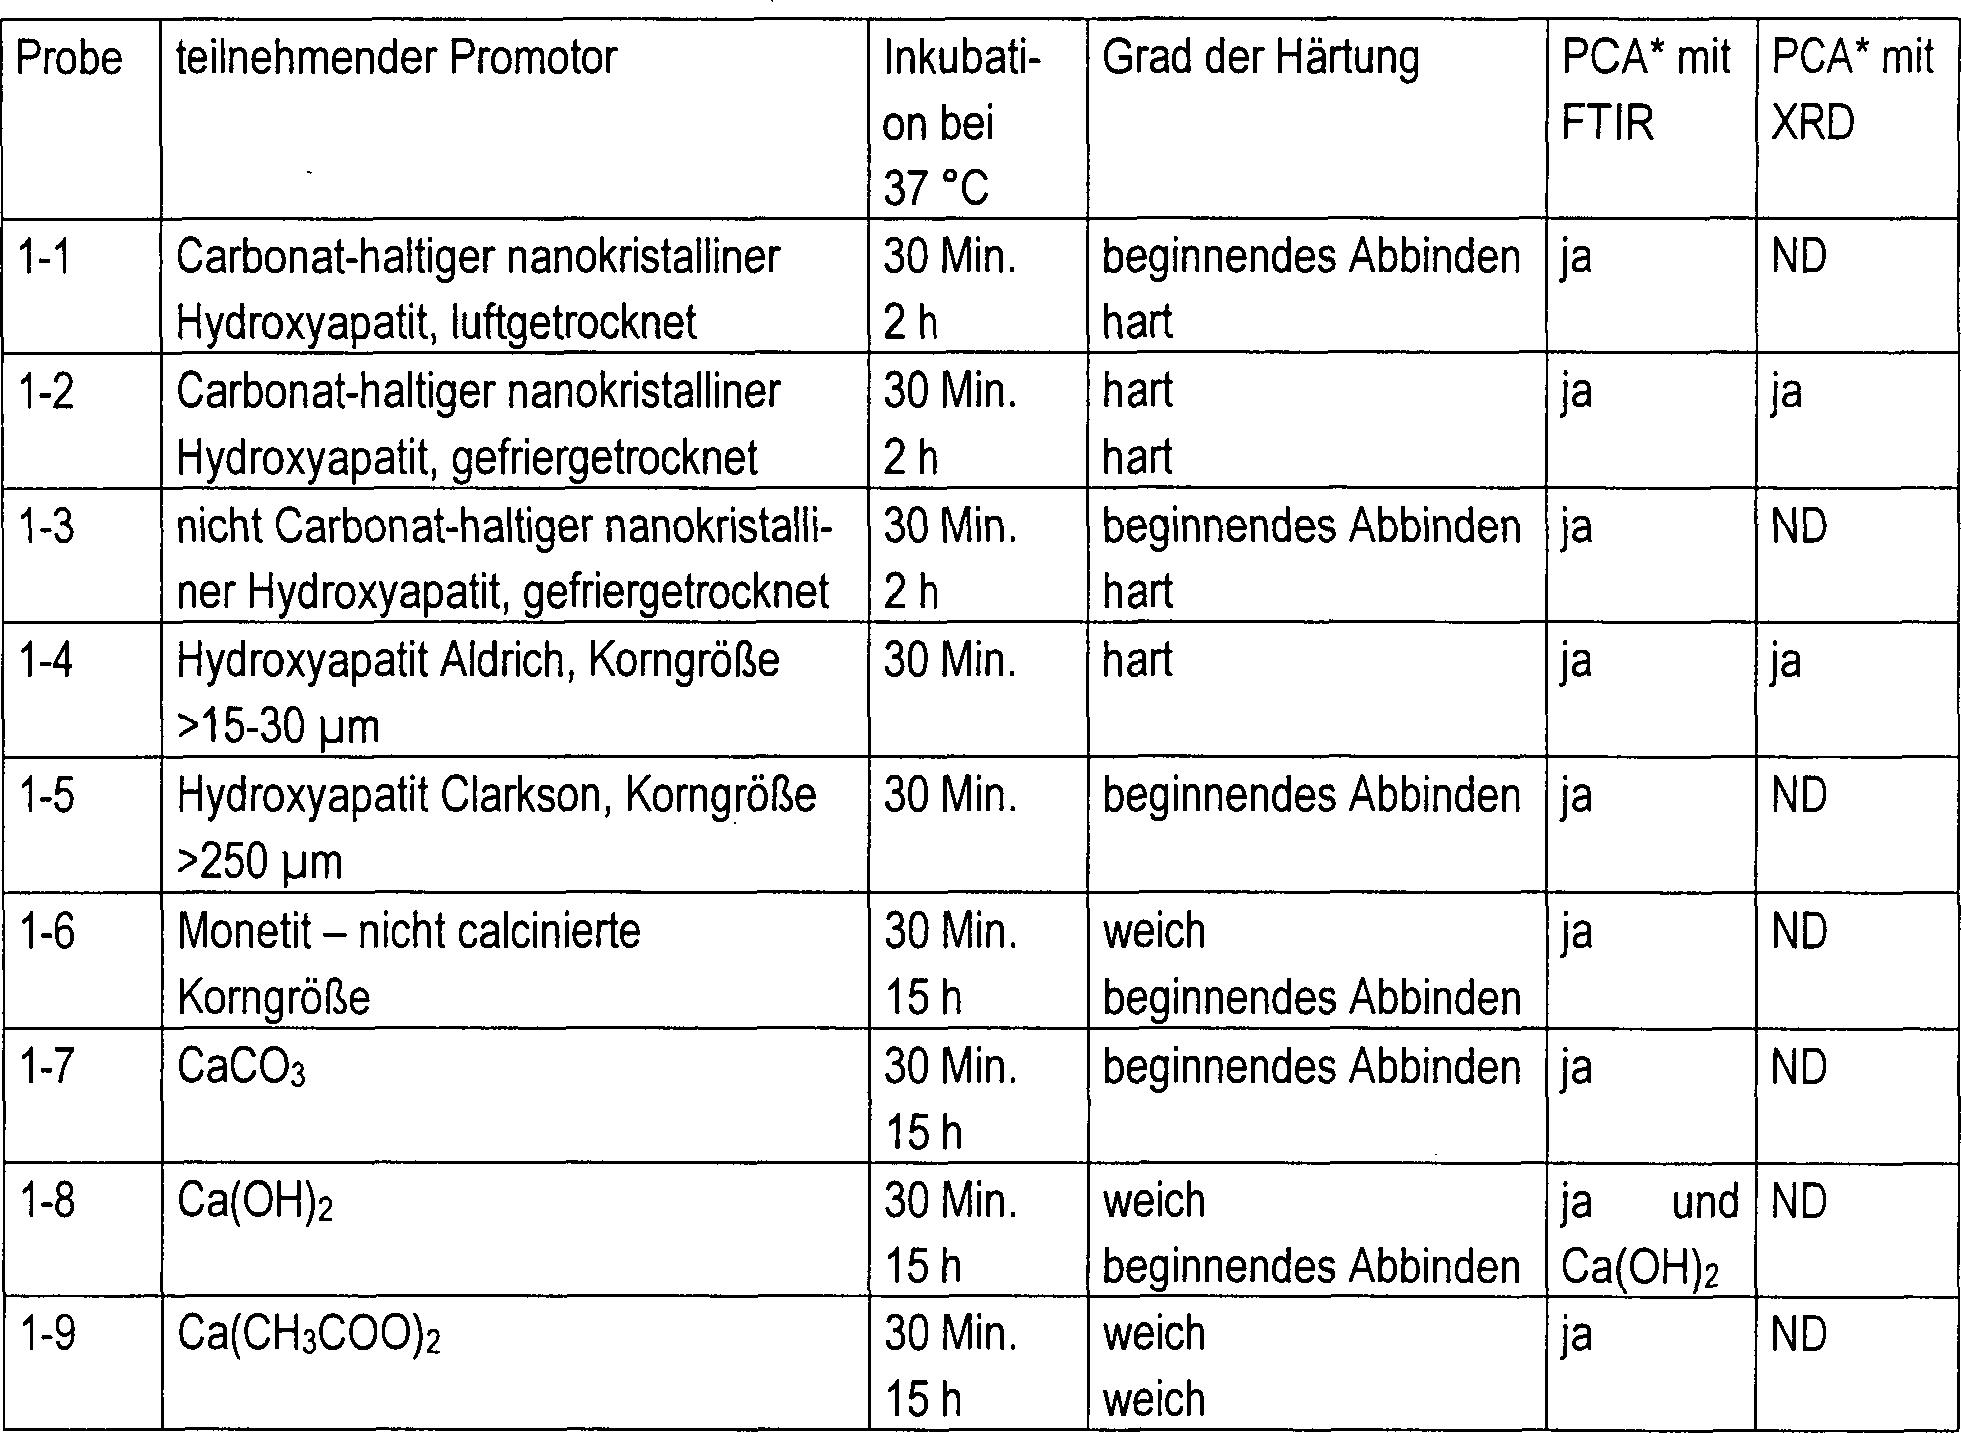 de69729647t2 - a process for preparing wenigkristallinem calcium